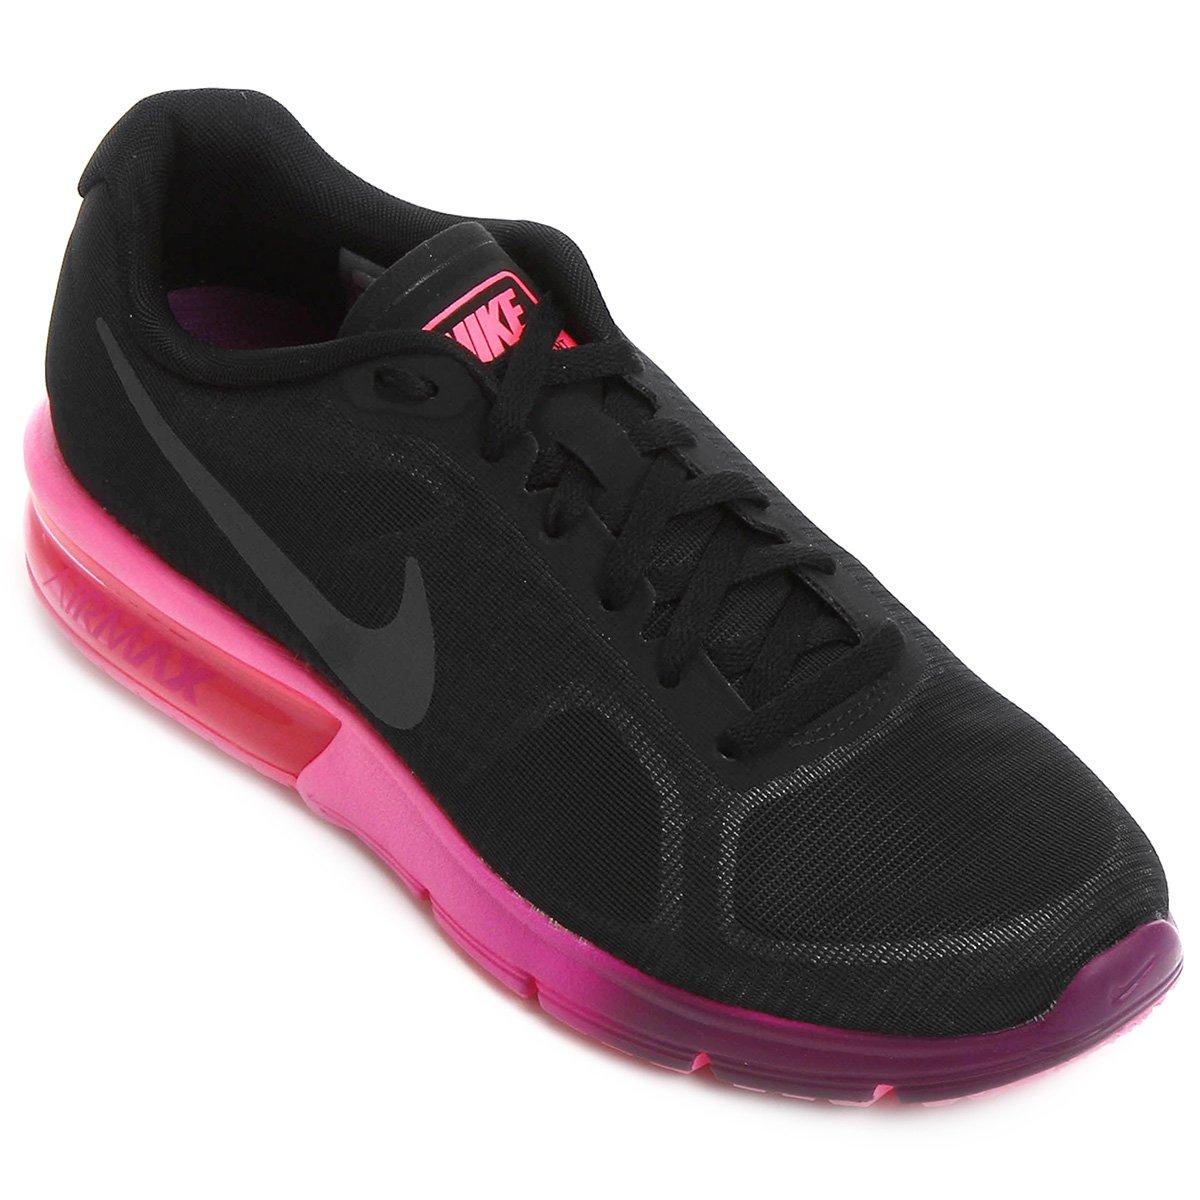 Tênis Nike Air Max Sequent Feminino - Compre Agora  3c40a15c283